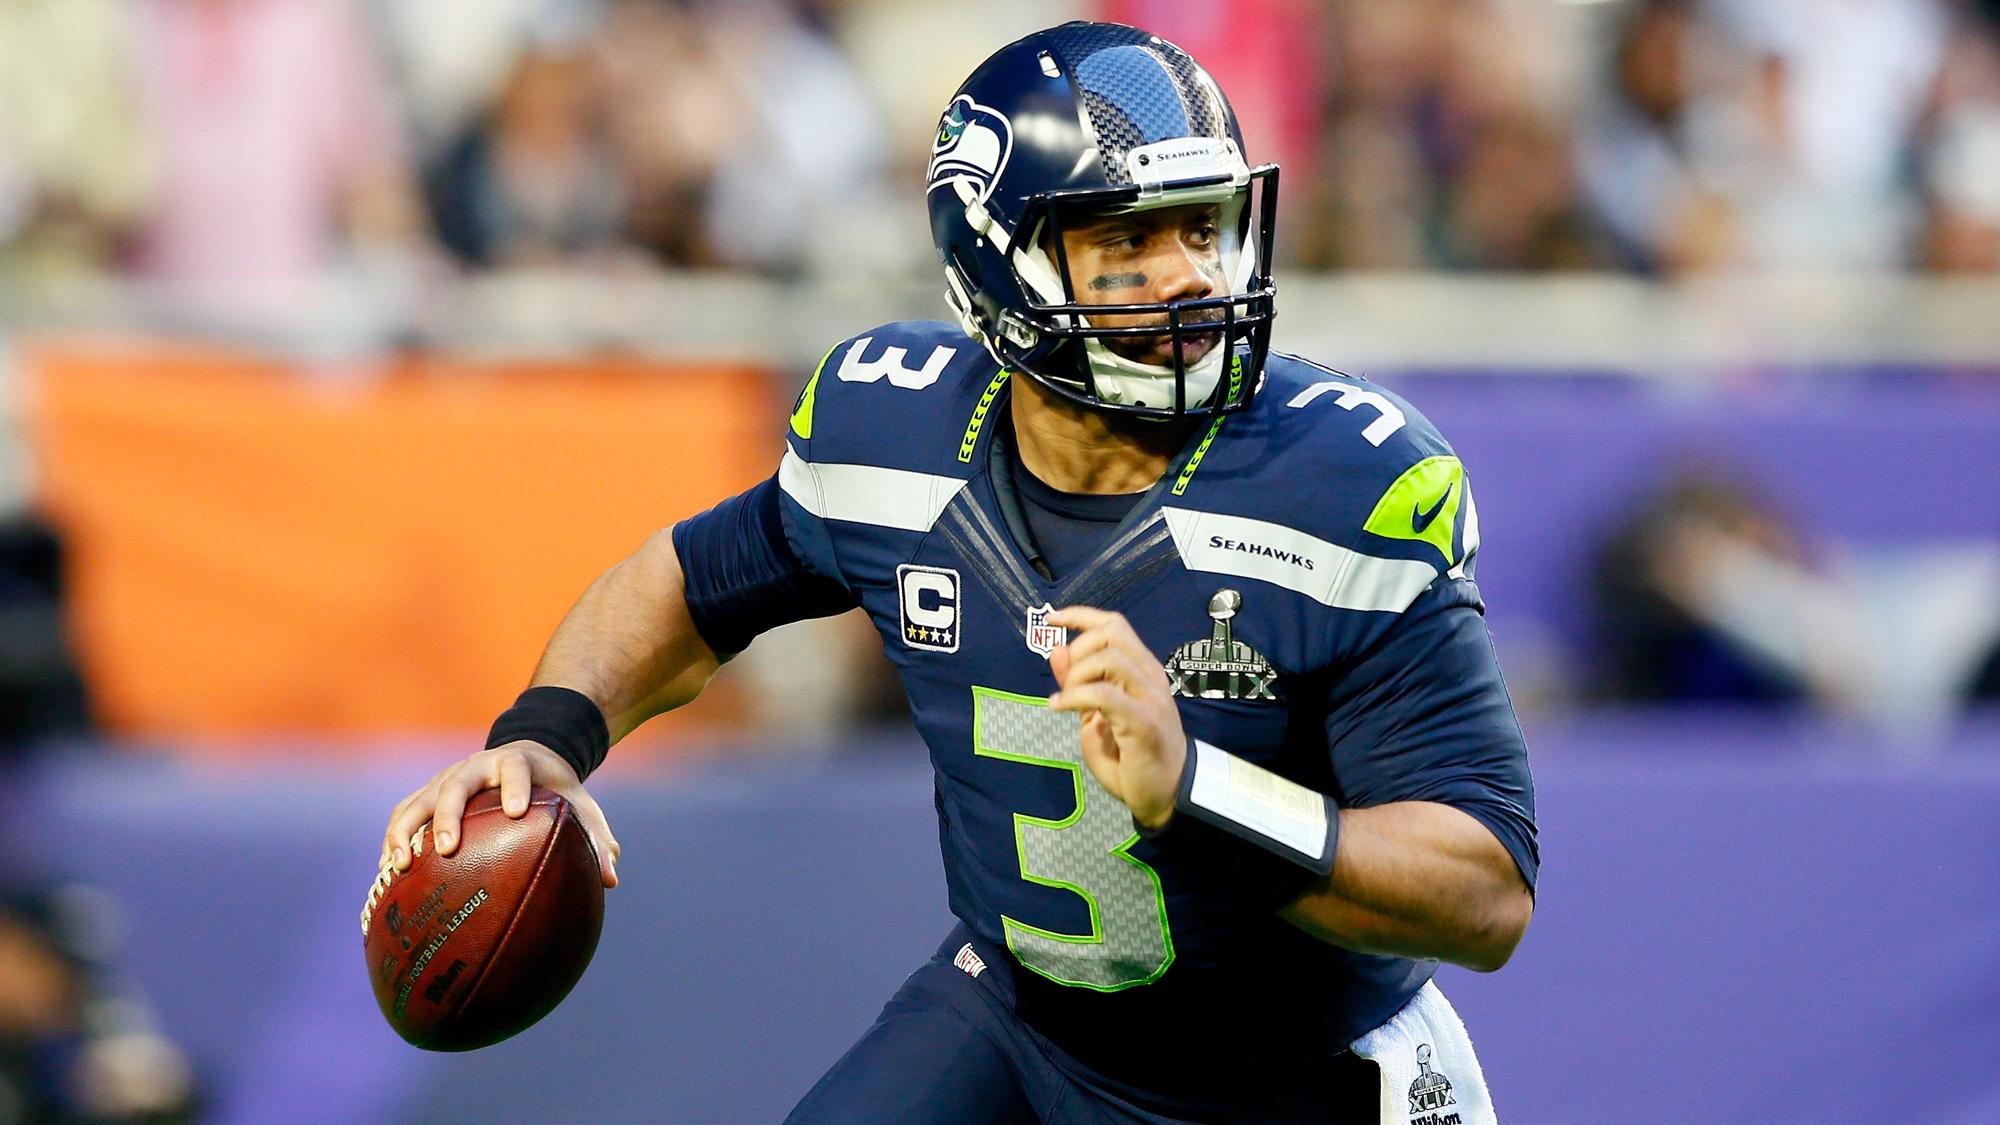 Super Bowl XLIX – New England Patriots v Seattle Seahawks